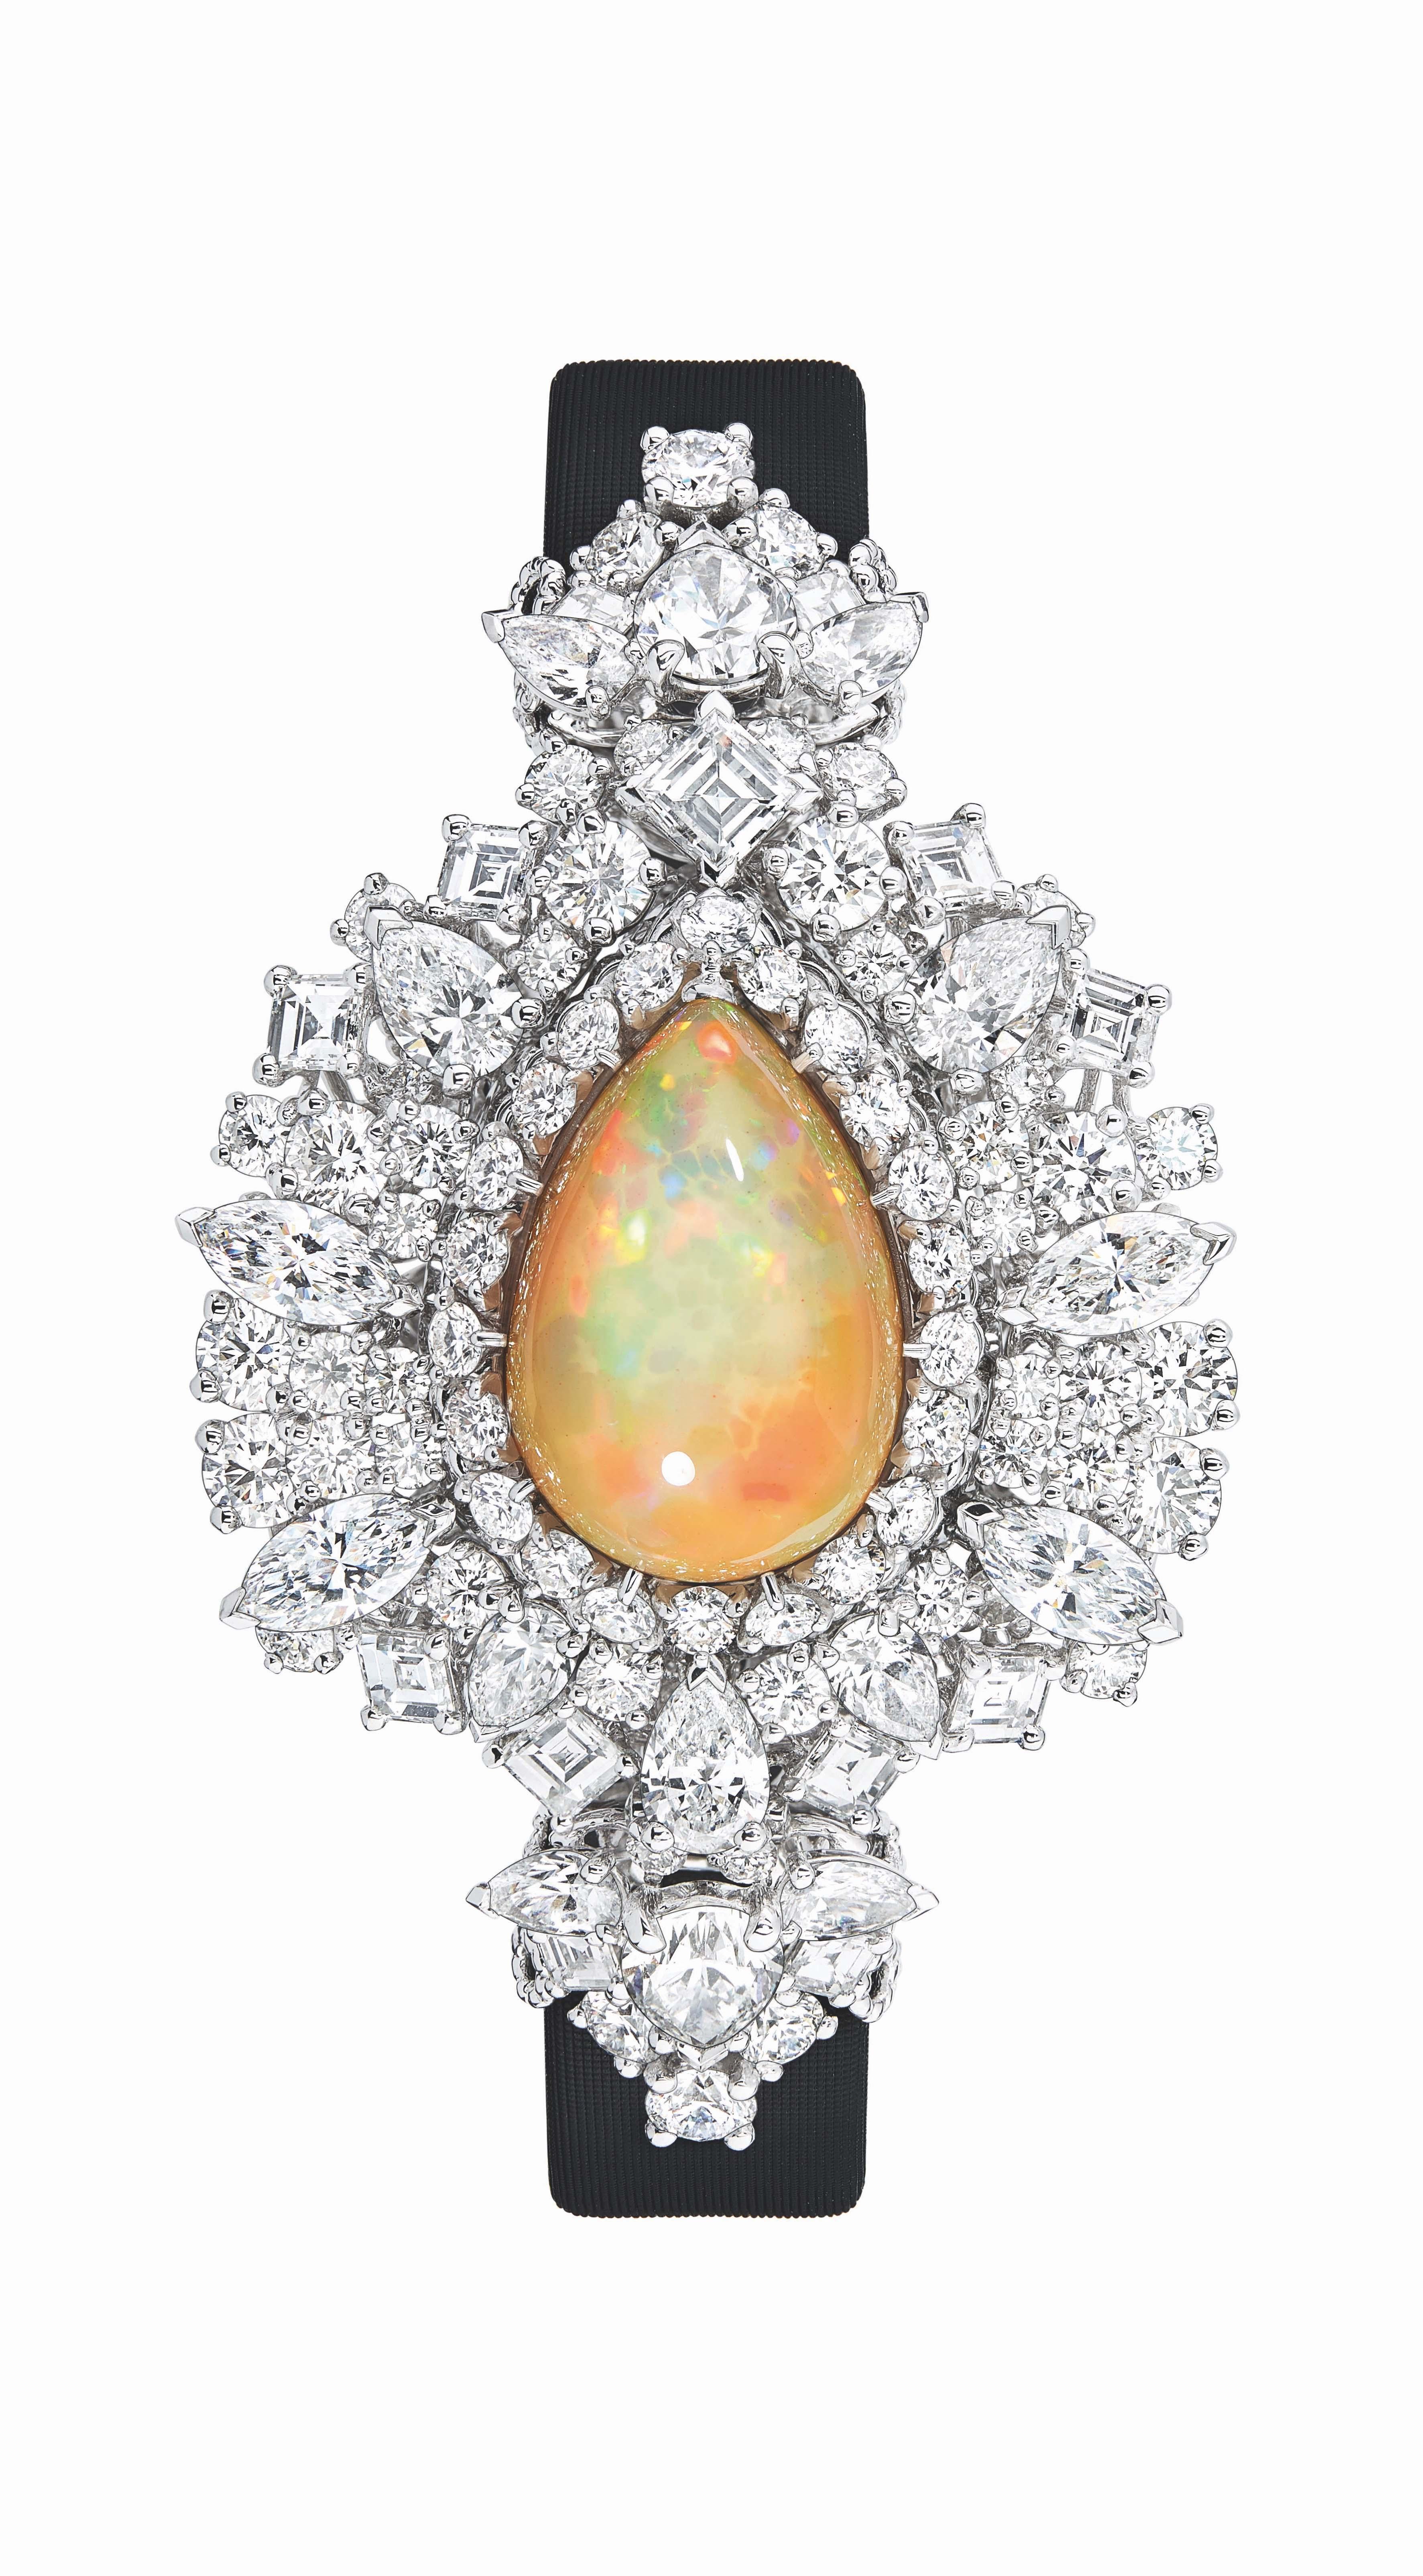 majestueuse-opal-high-jewellery-timepiece-1